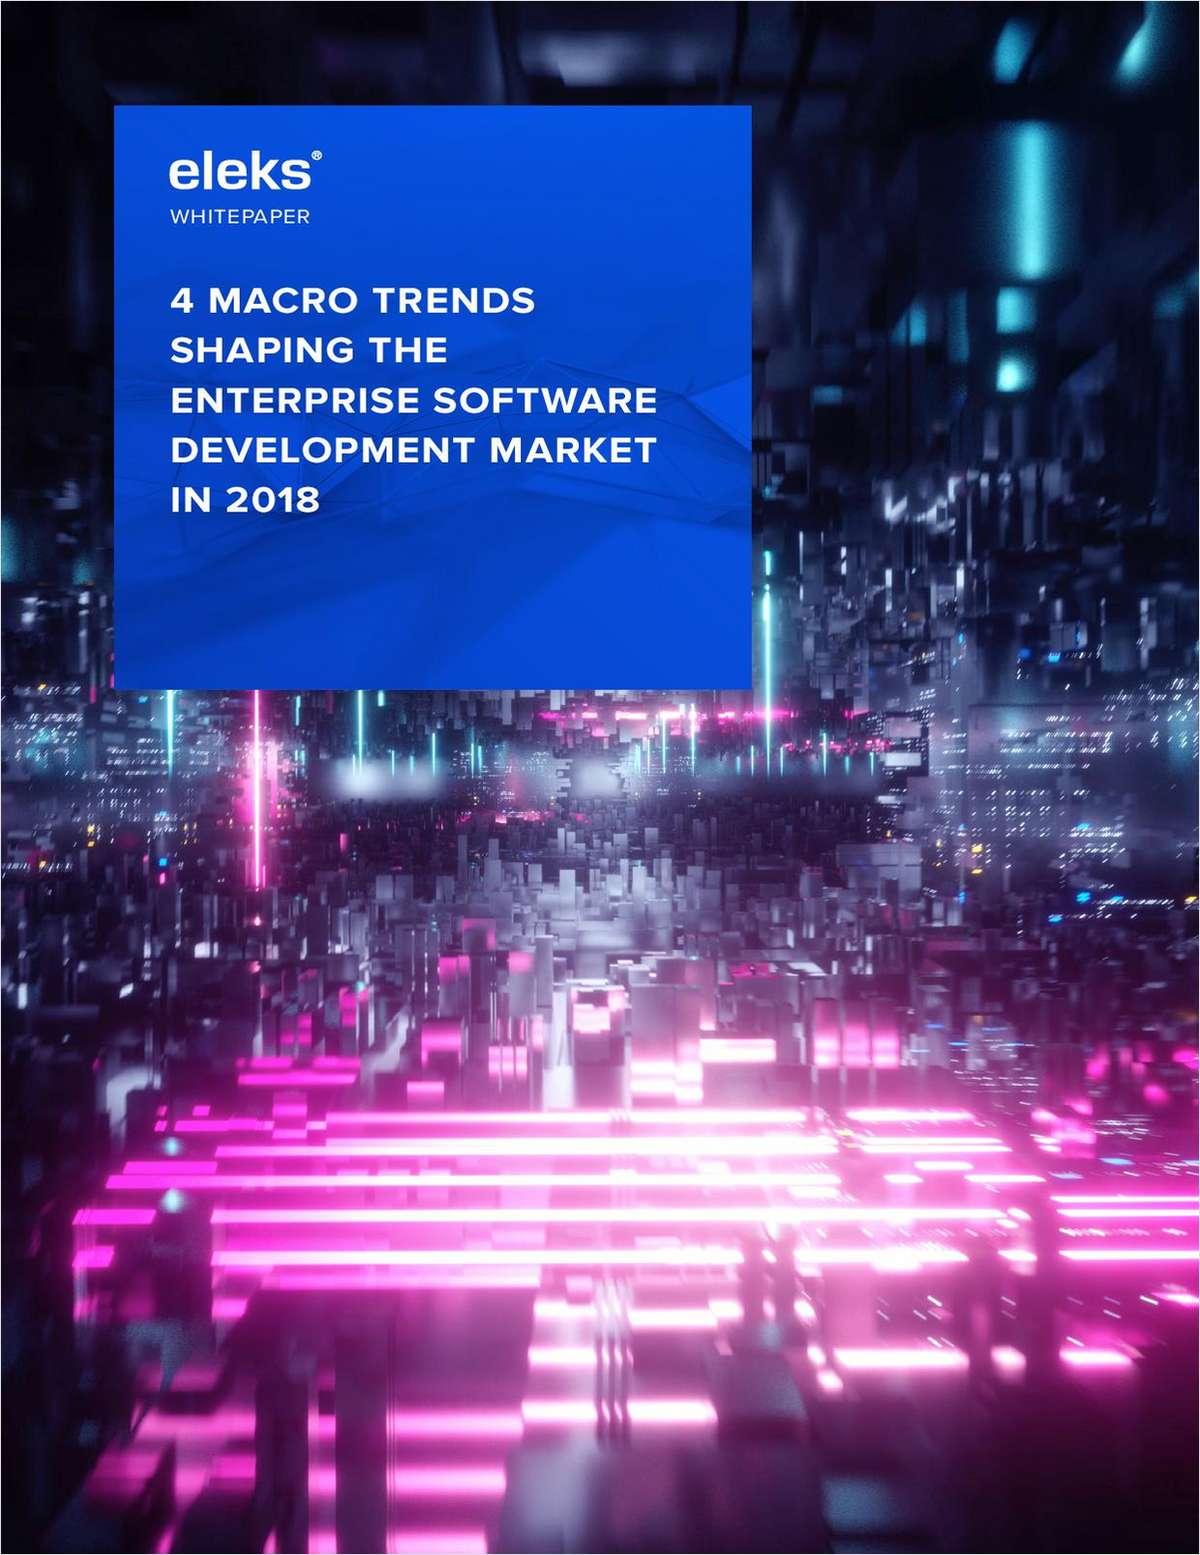 4 Macro Trends Shaping The Enterprise Software Development